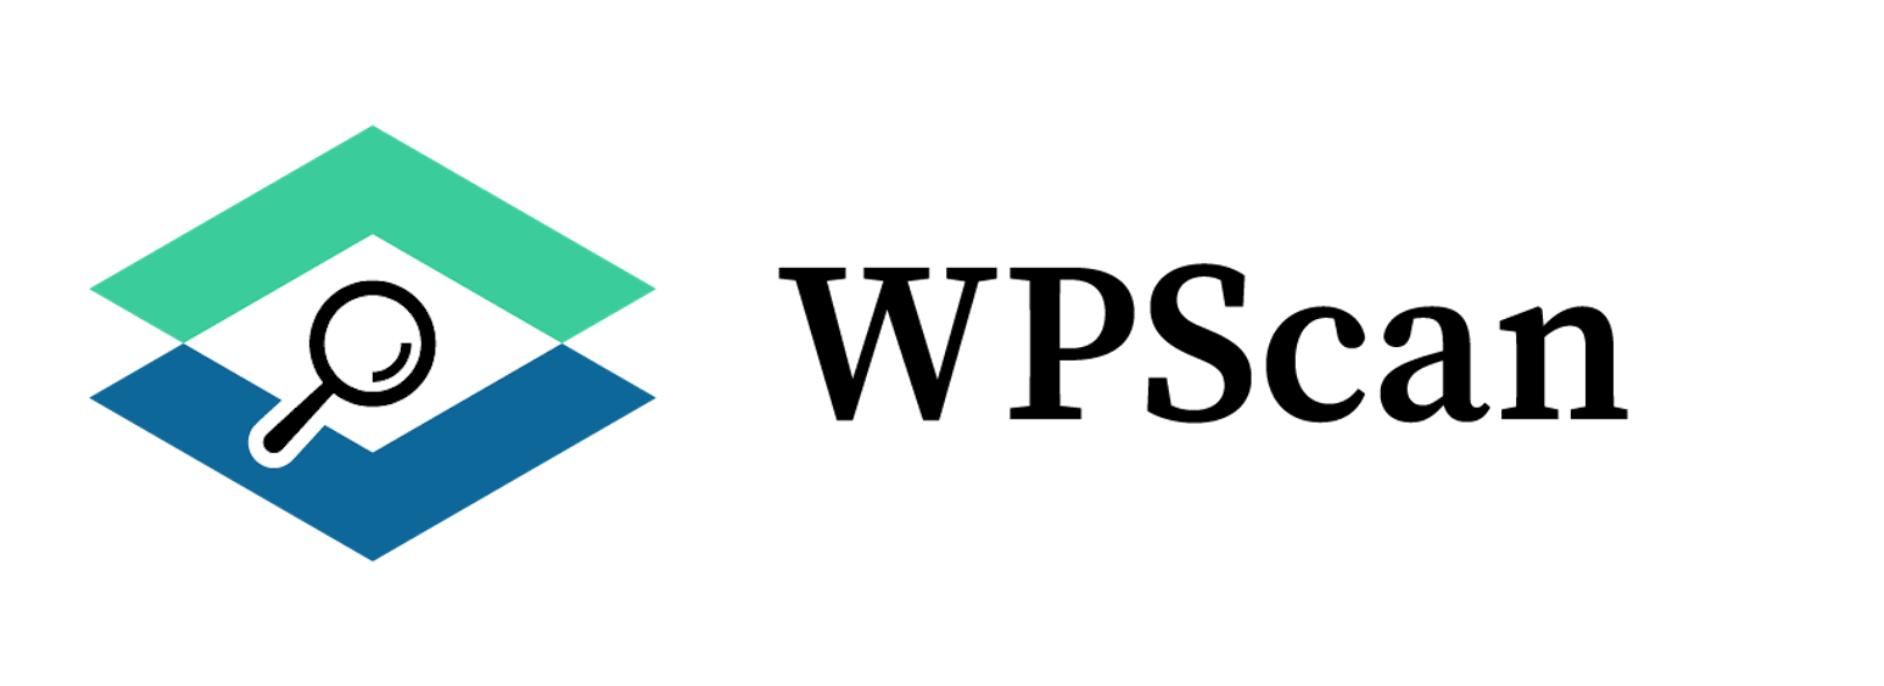 WPScan - плагин поиска уязвимостей WordPress